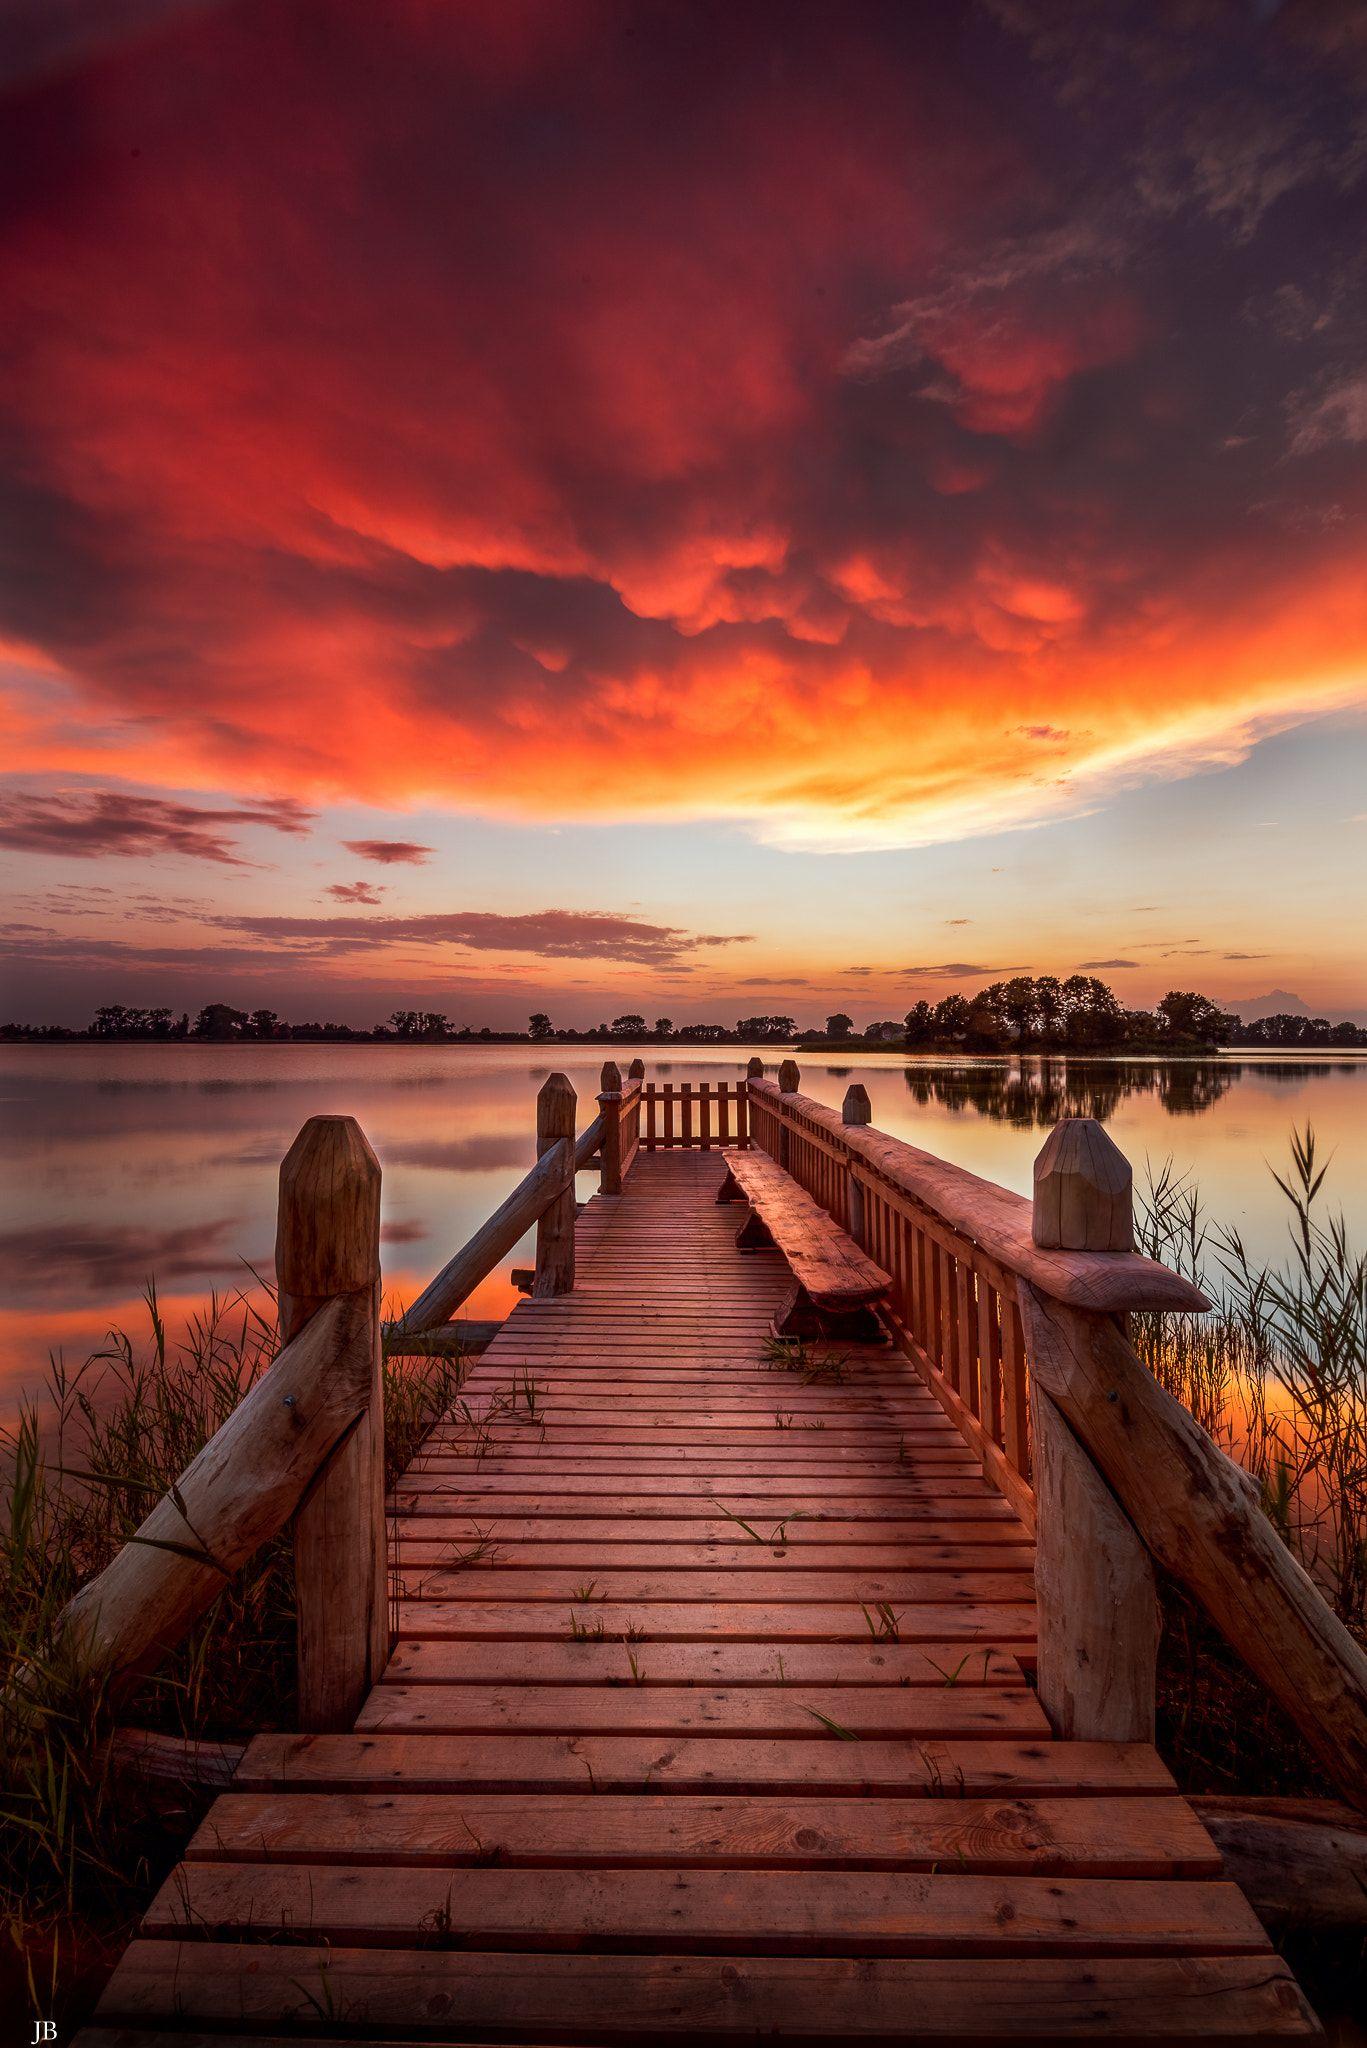 Amazing Sunset Beautiful Sunset In Lednica Lake Poland Sunset Pictures Amazing Sunsets Beautiful Landscapes